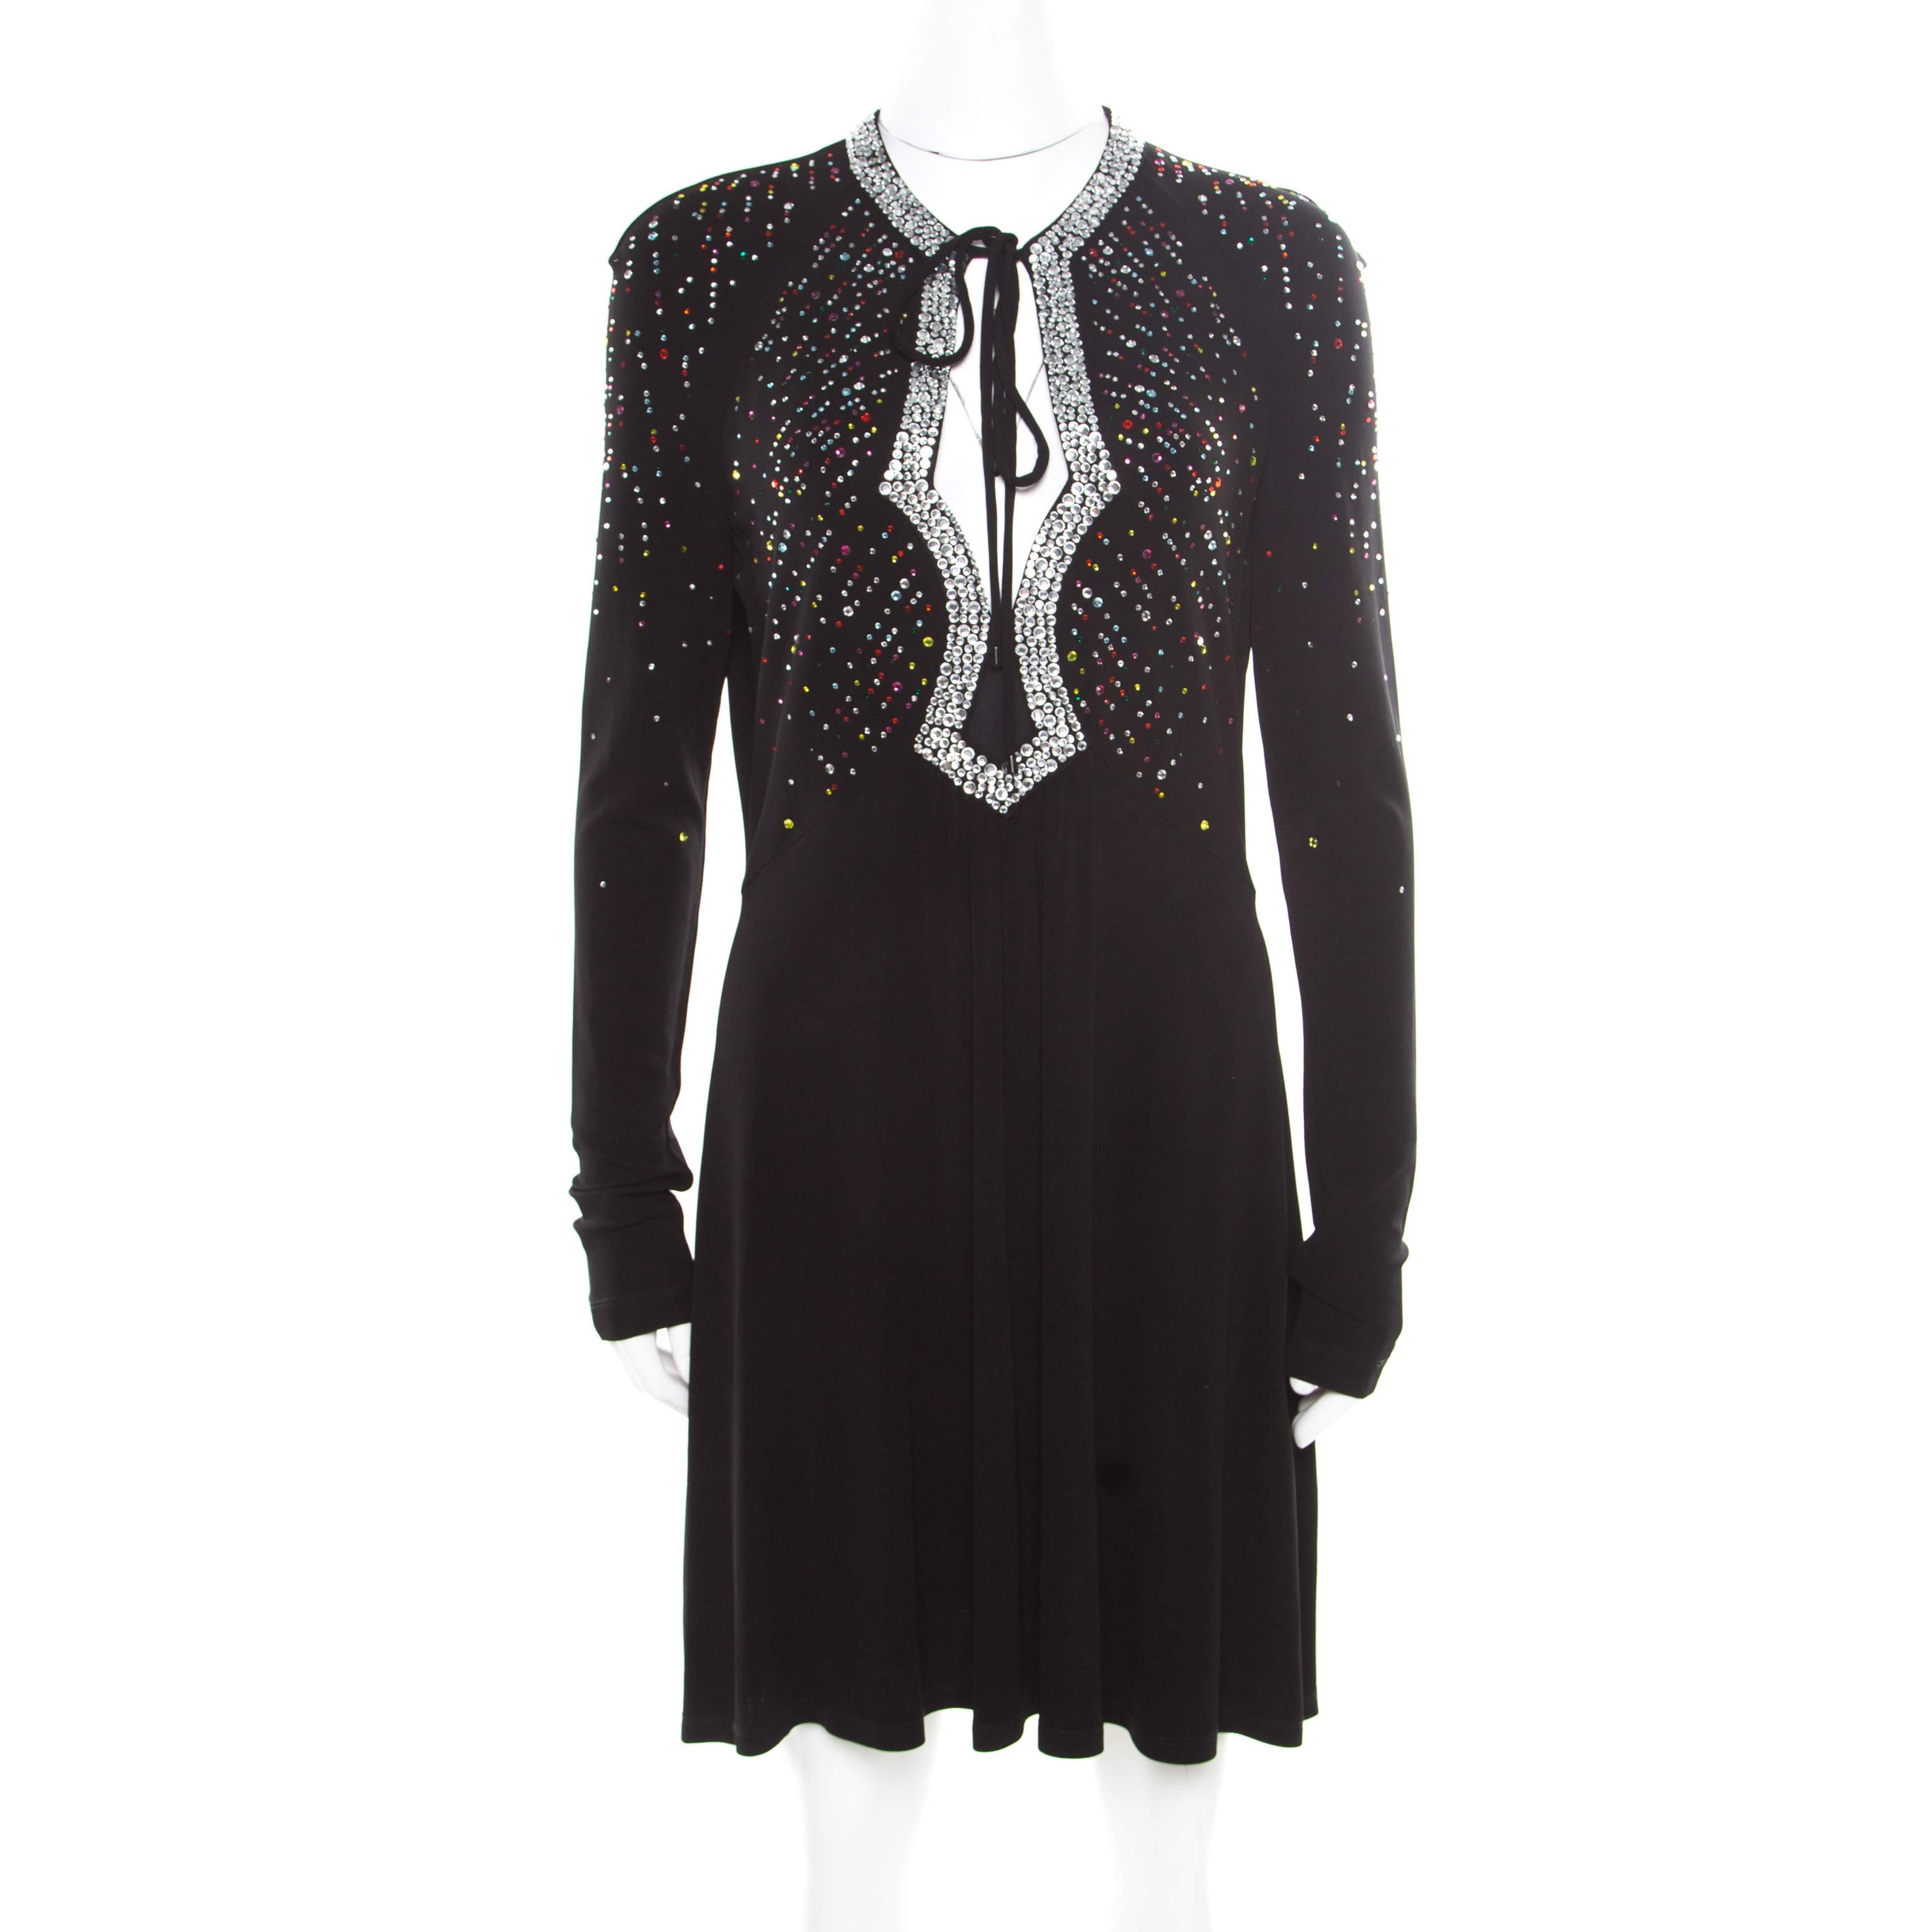 Just Cavalli Black Knit Multicolor Crystal Embellished Long Sleeve Dress M